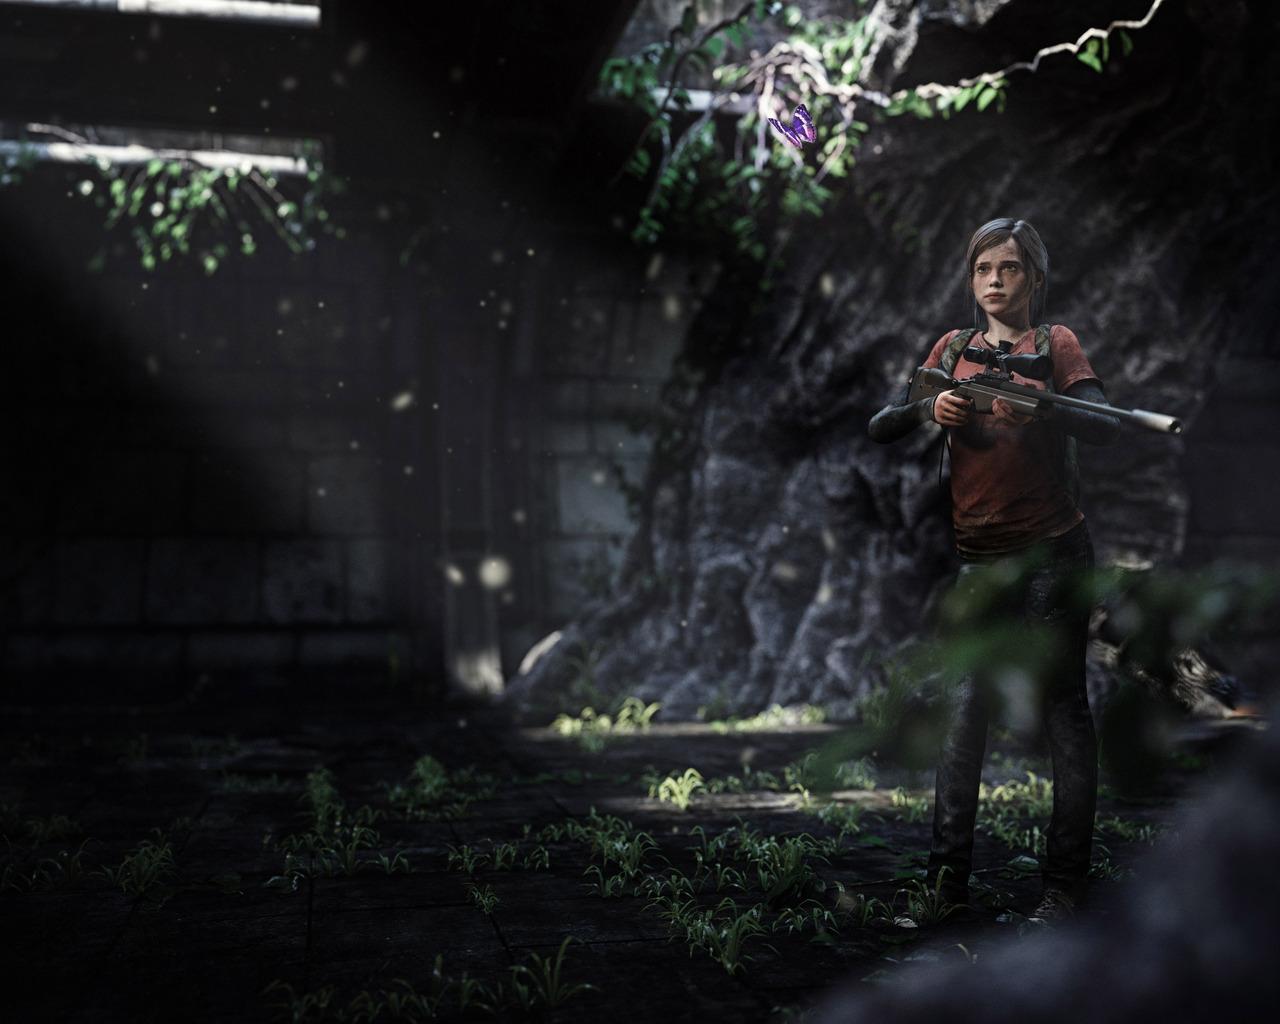 1280x1024 Elle The Last Of Us 3d Art 1280x1024 Resolution Hd 4k